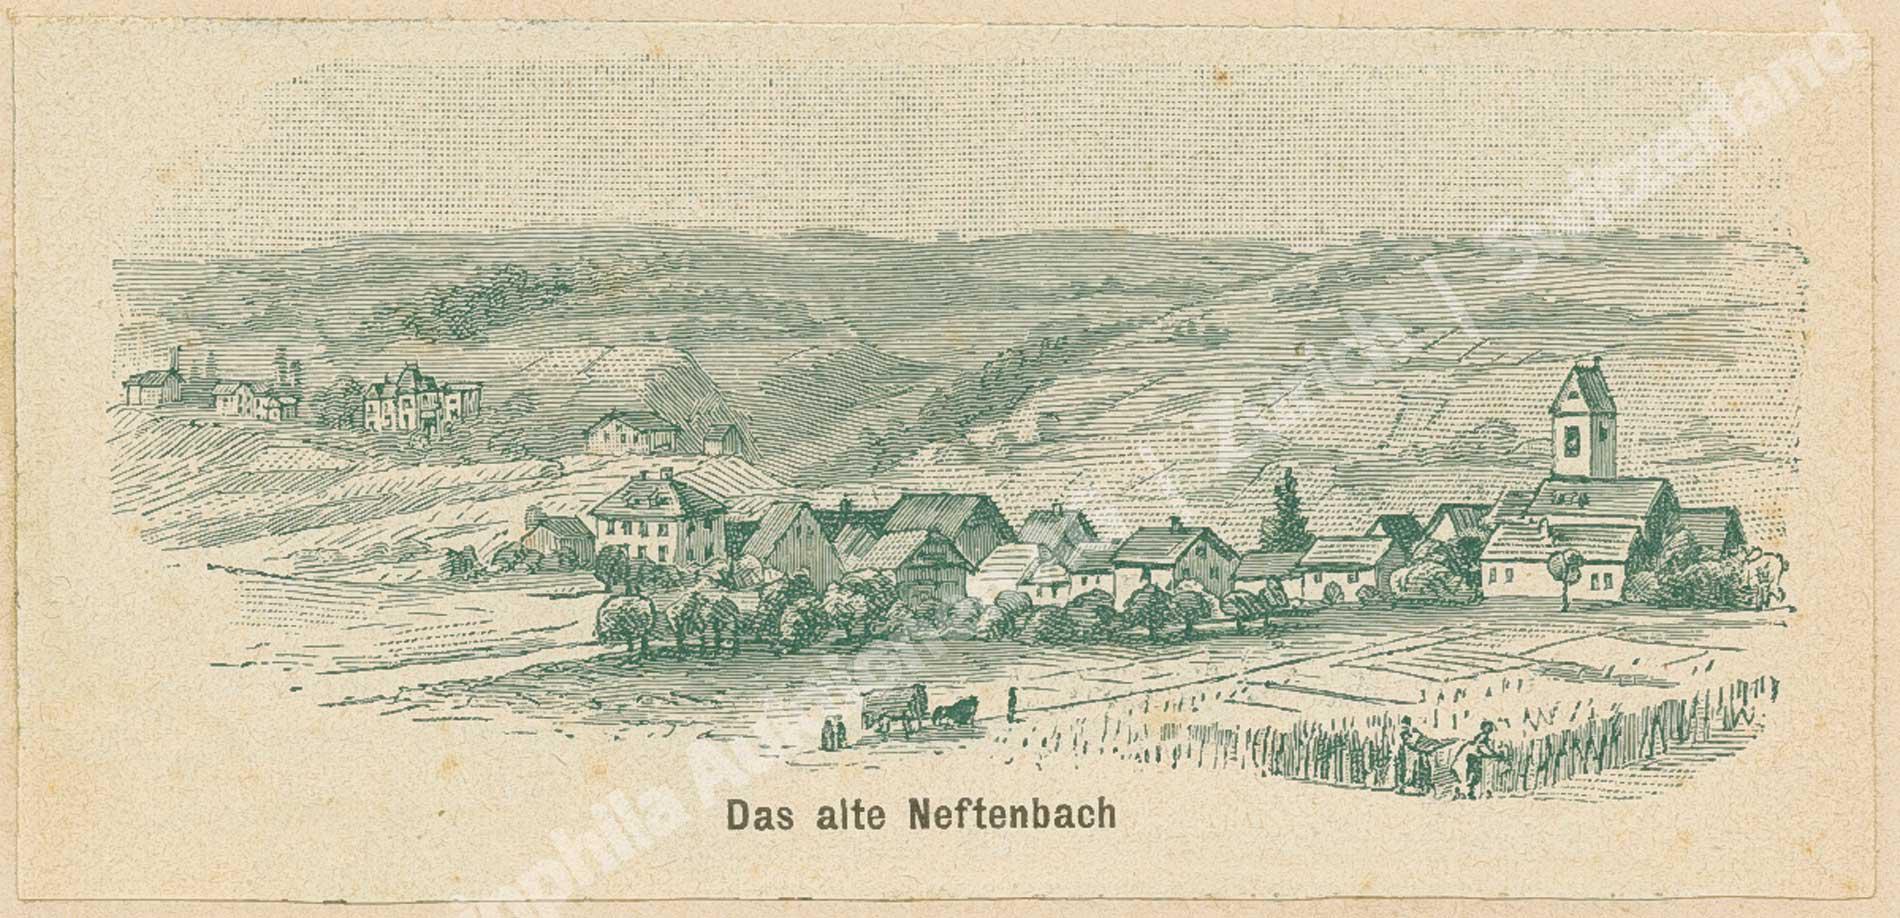 Neftenbach